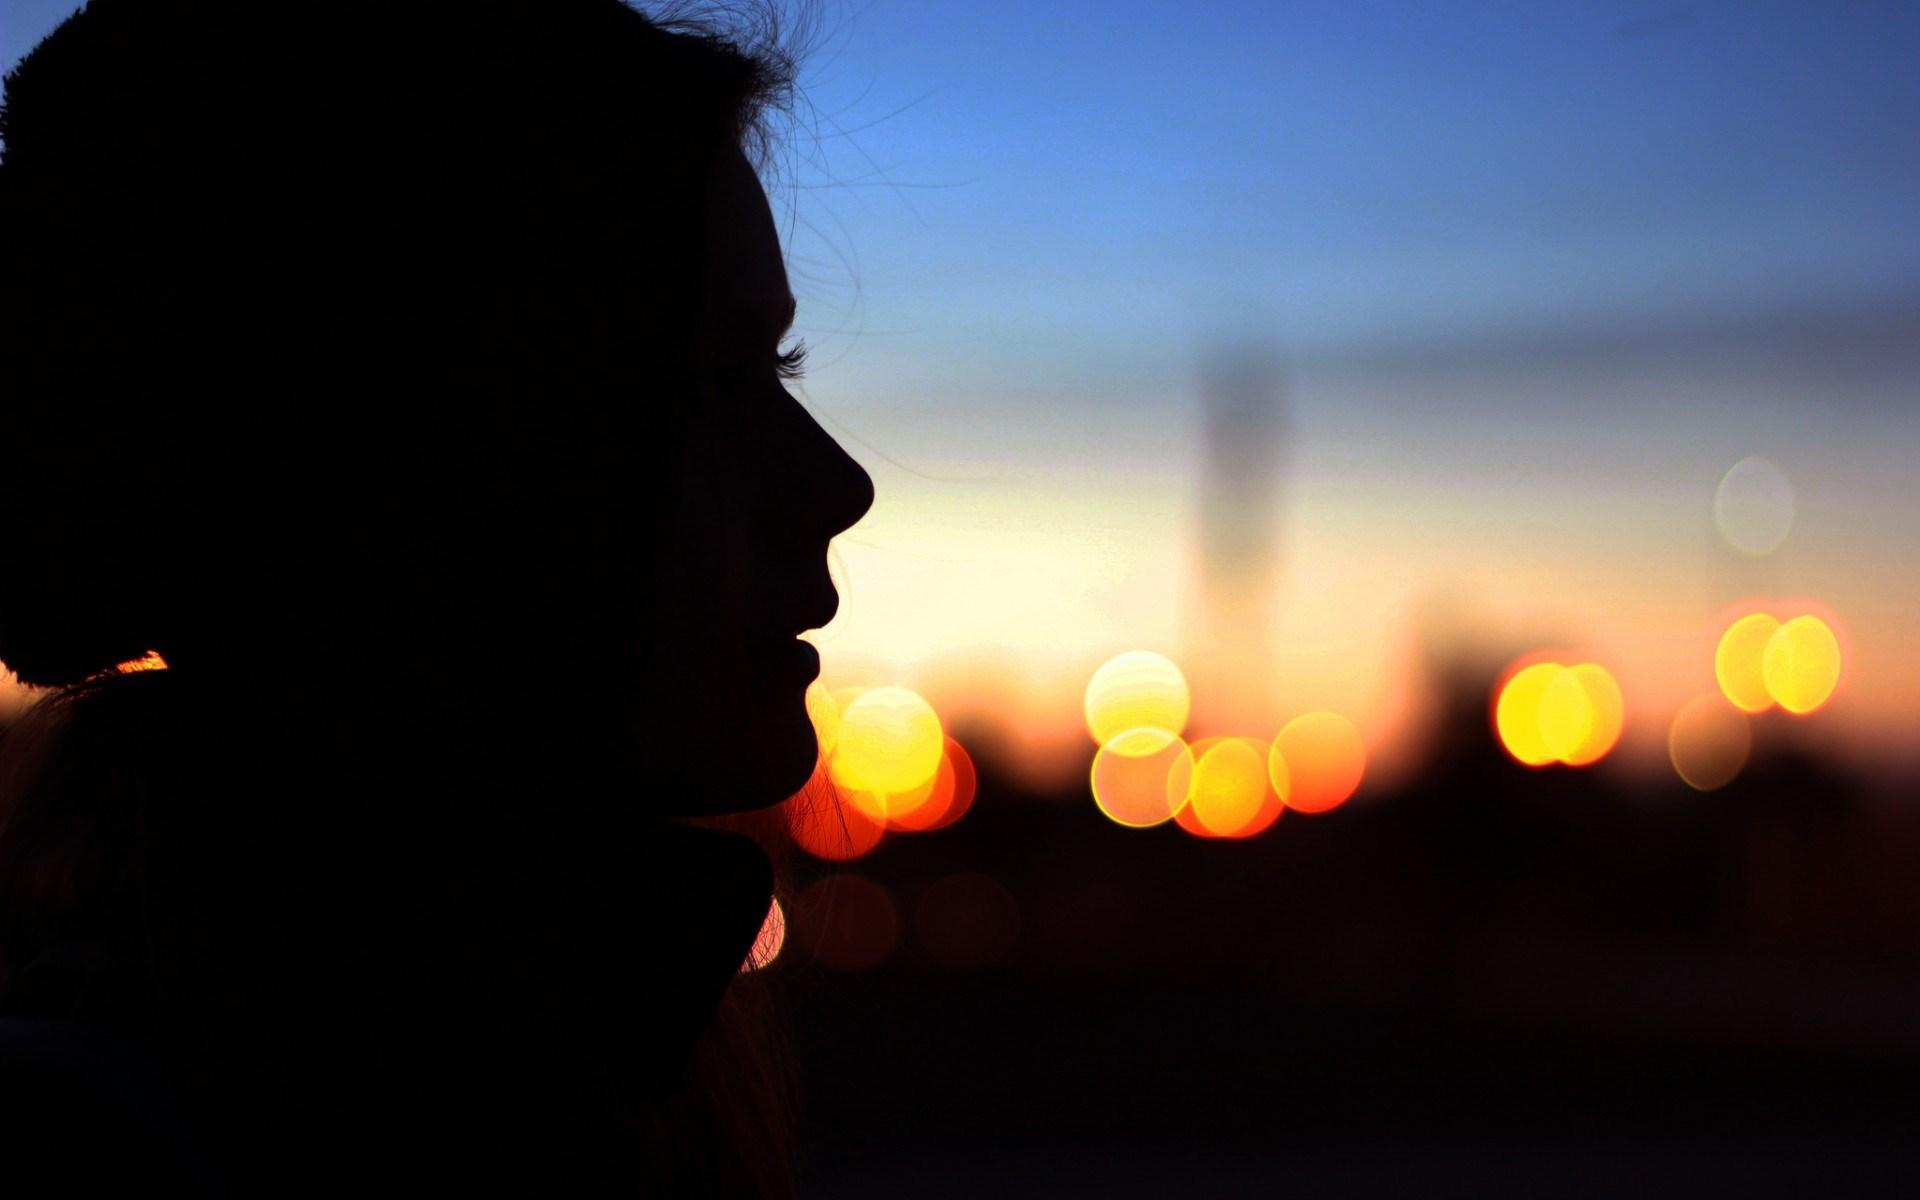 Mood Girl Profile Silhouette Evening Bokeh